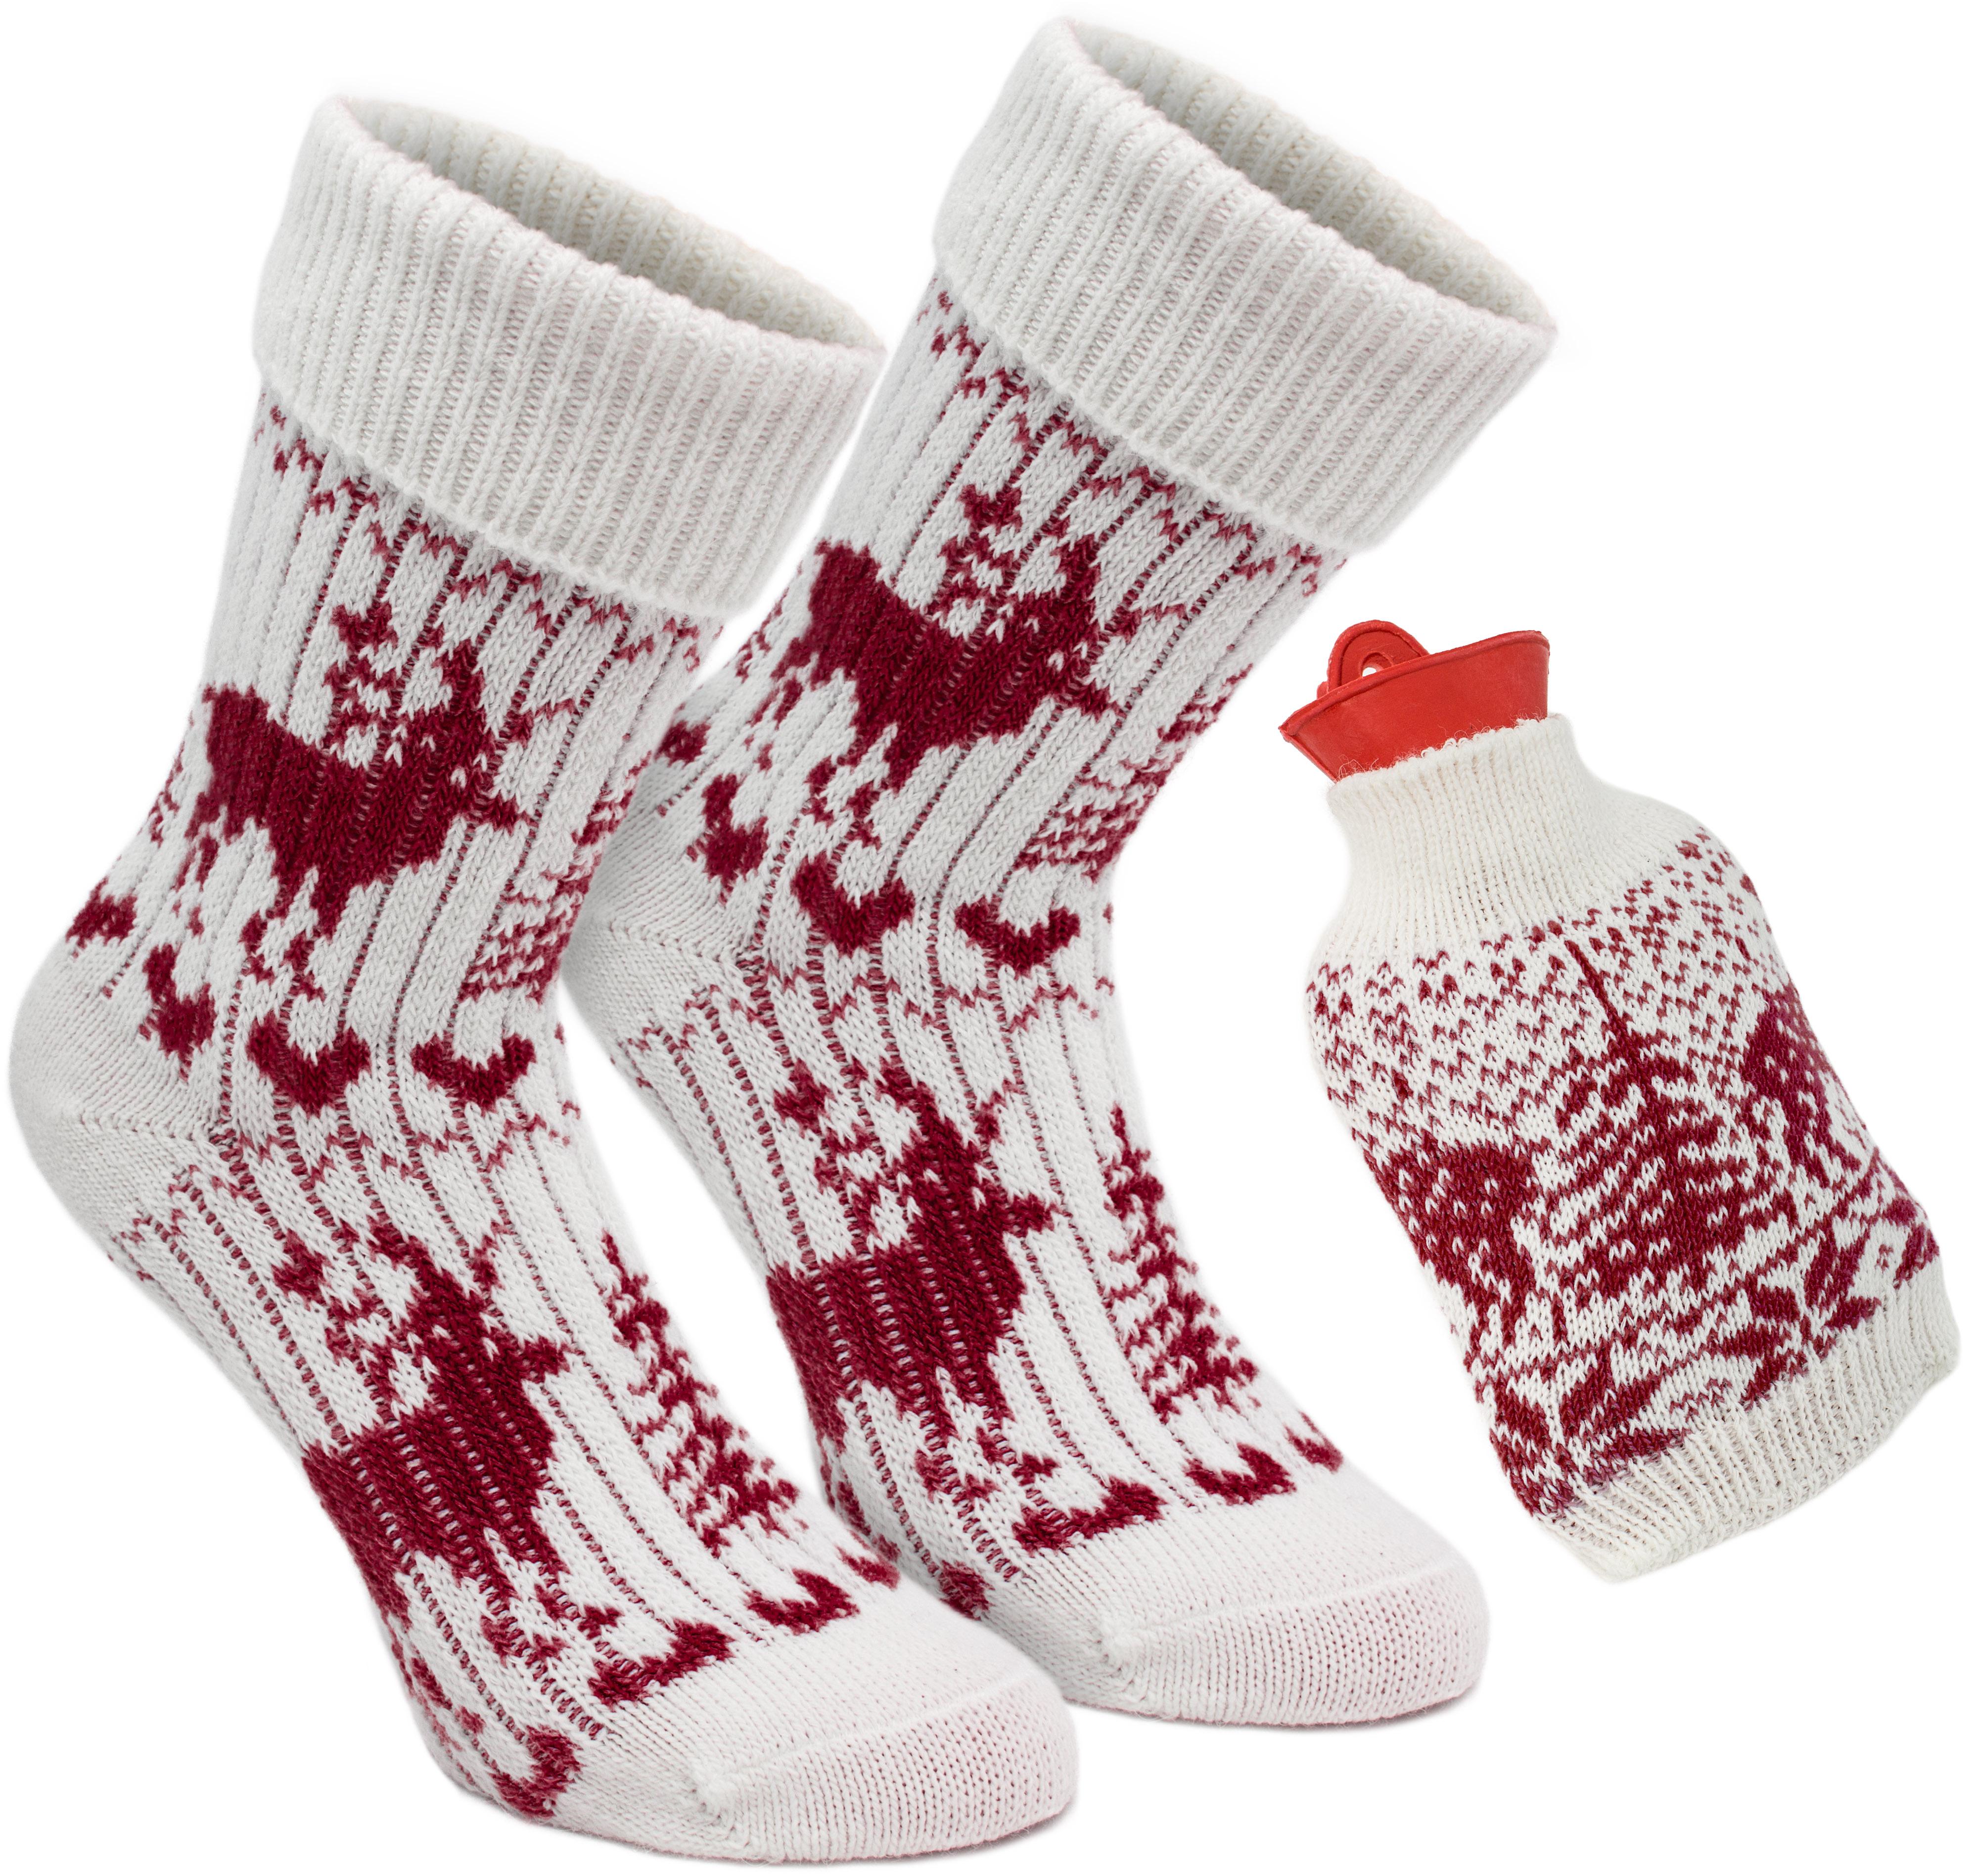 Neu werden doppelter gutschein Bestpreis 1 Paar Damen Norweger Socken - Kuschel Geschenk Set